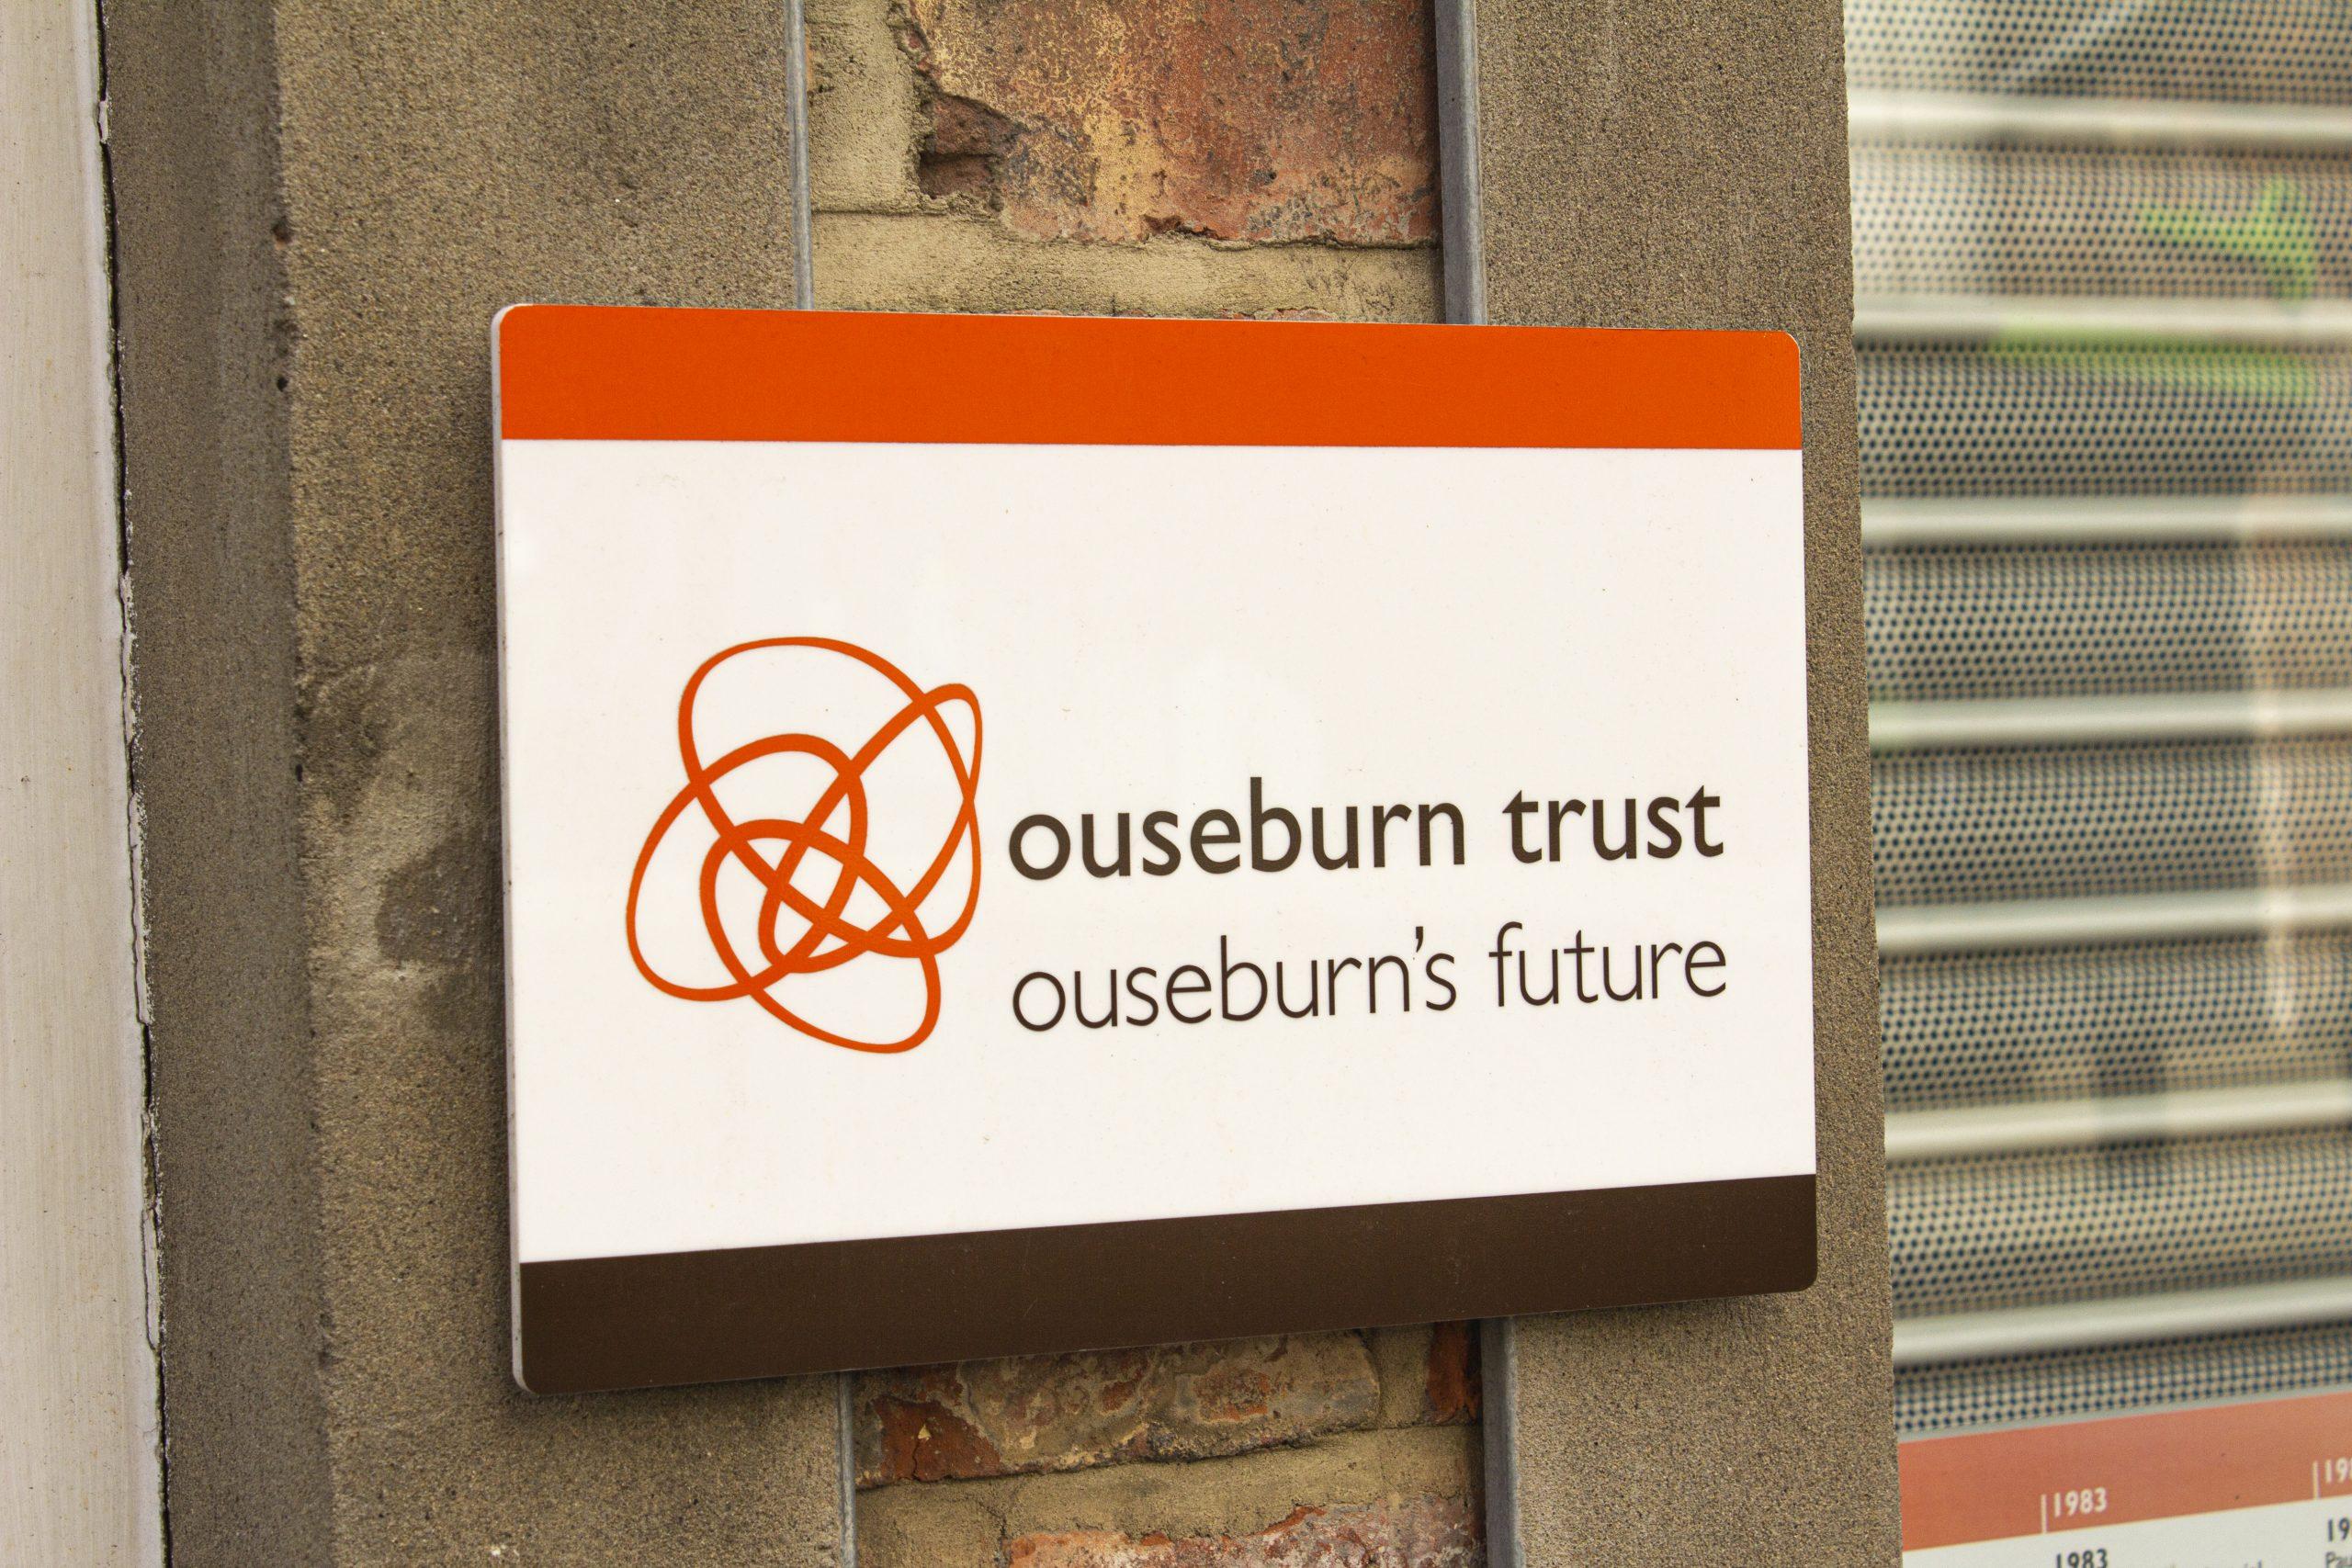 Ouseburn Trust